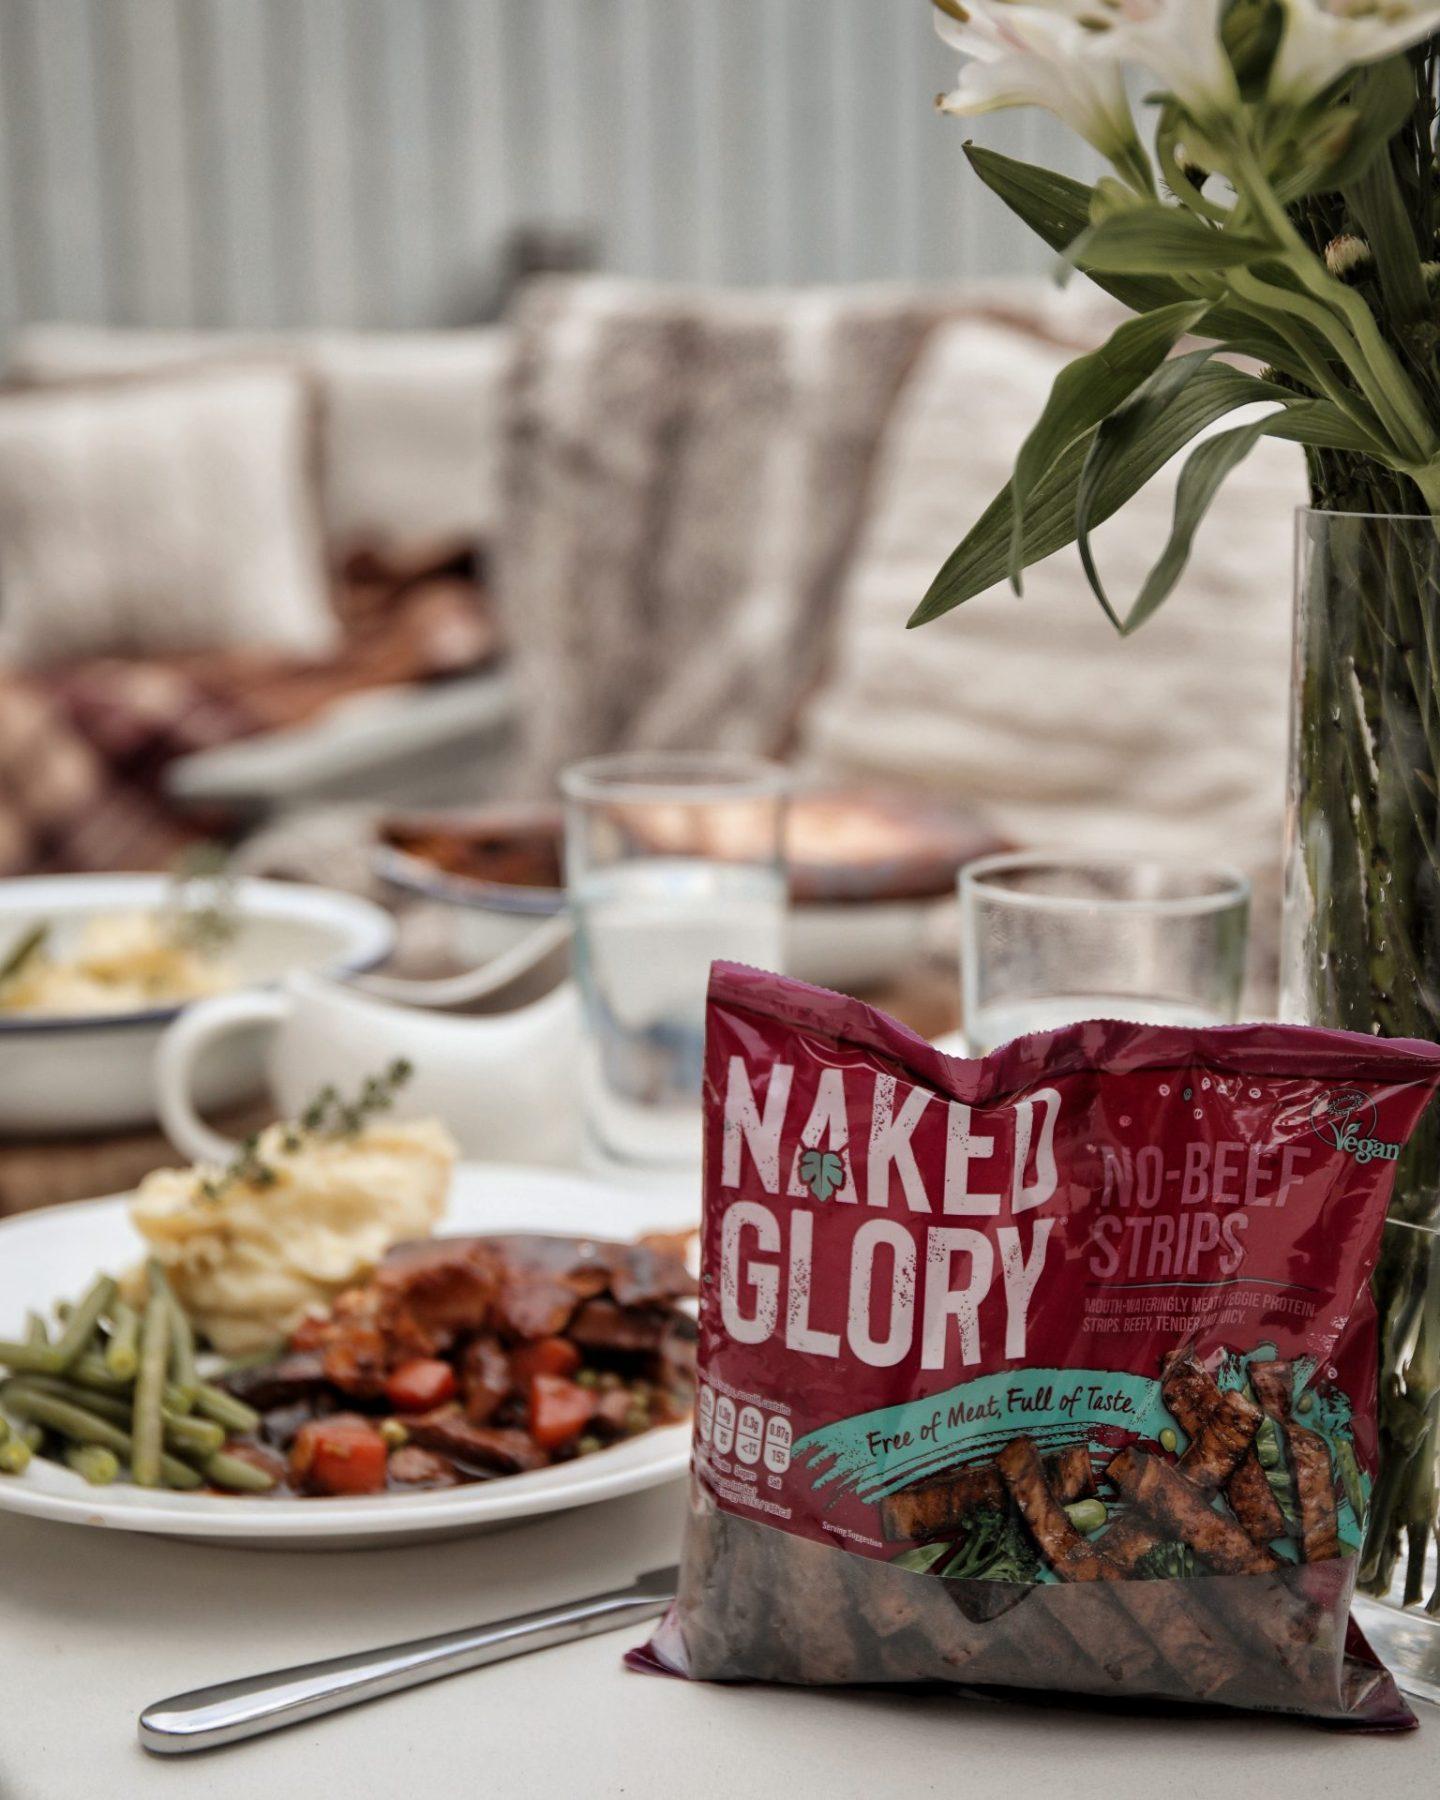 Naked Glory Steak Ale Pie Veganuary Meat Free Recipe